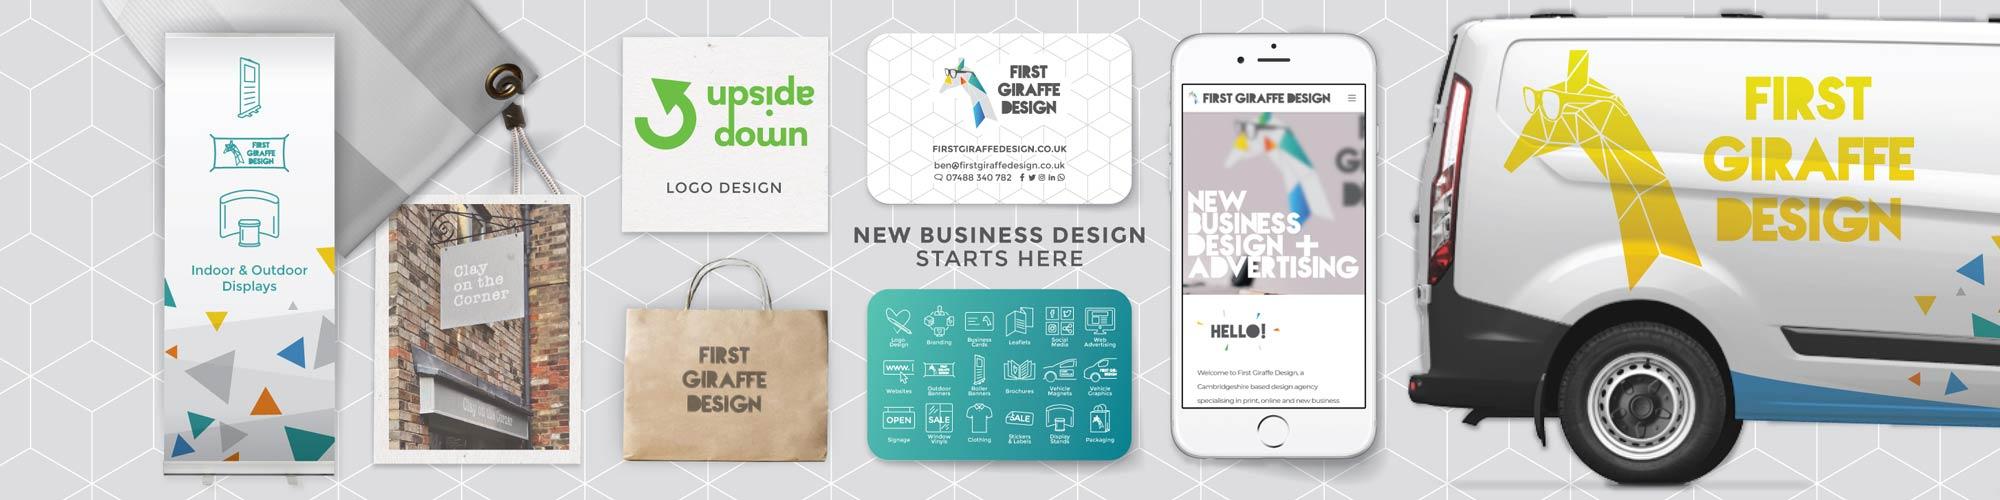 Business Design & Branding